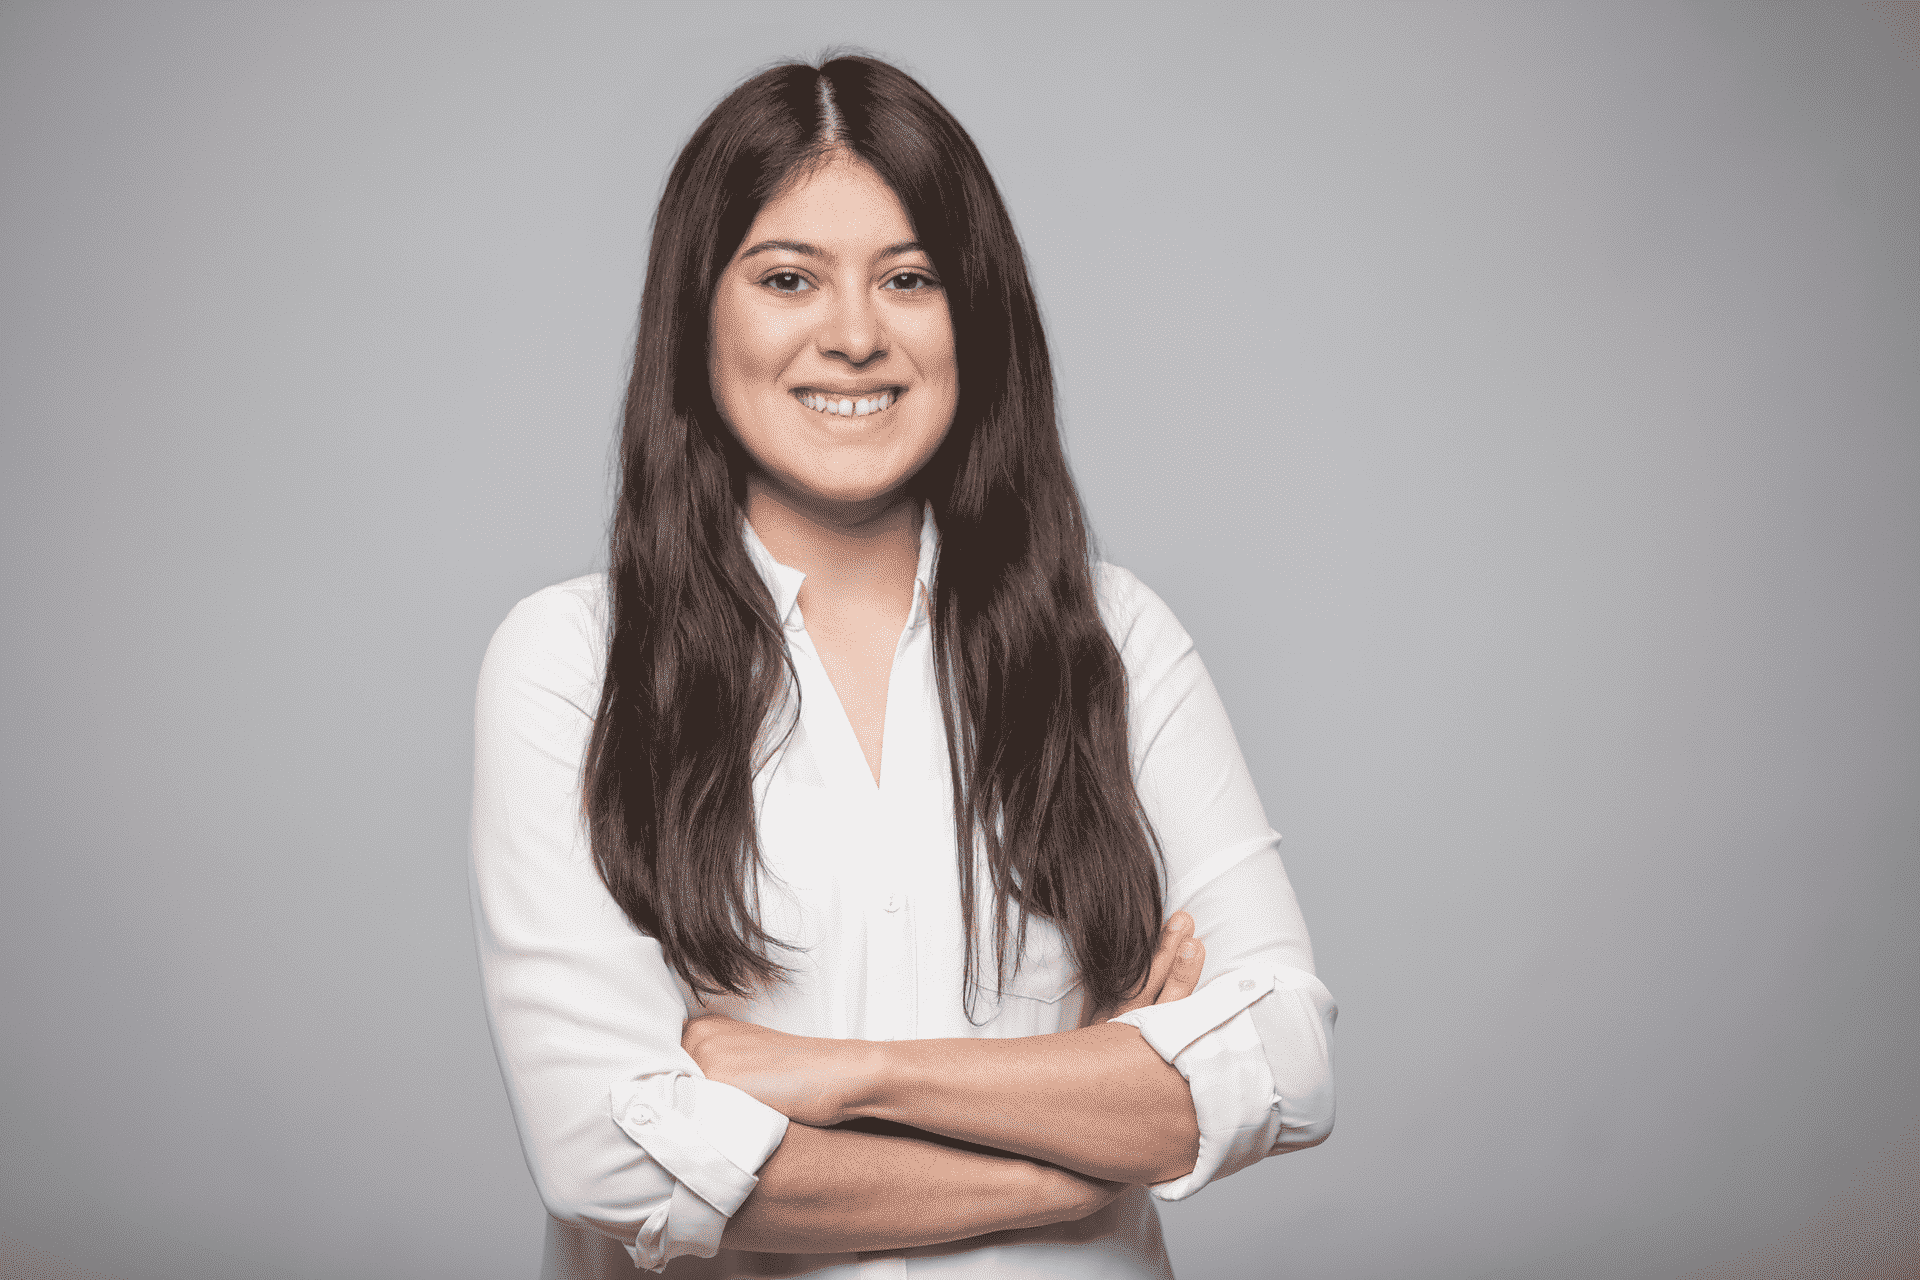 Sophia Jaimes-Ramos